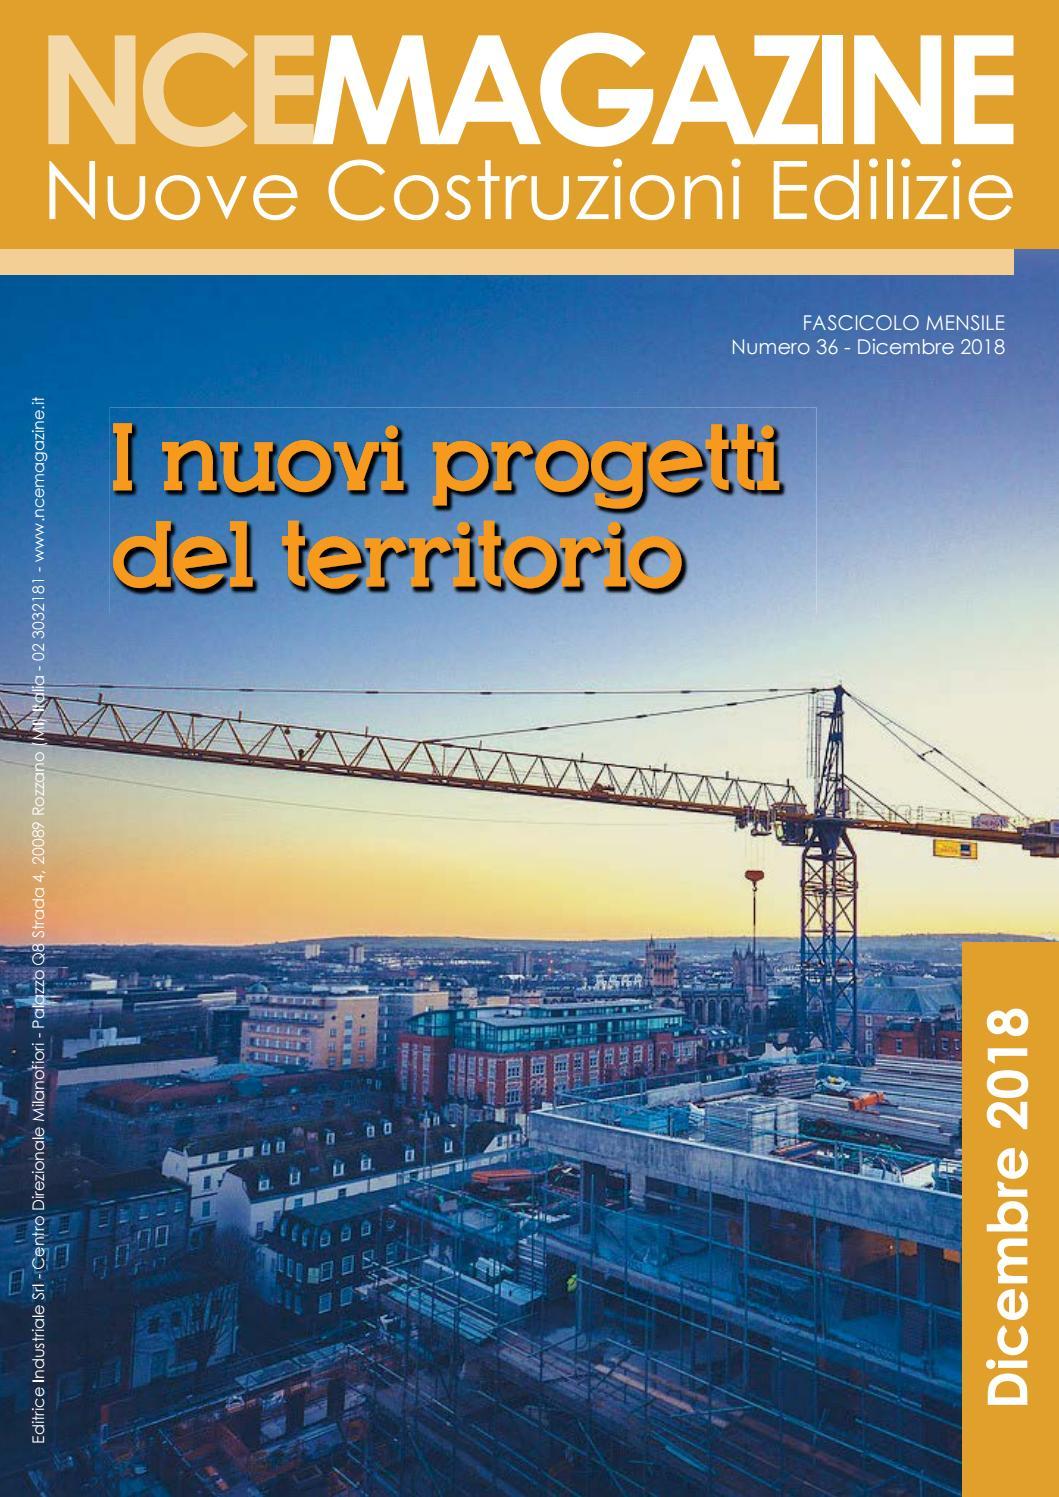 Progetti Srl Carate Brianza ncemagazine by ncemagazine - issuu